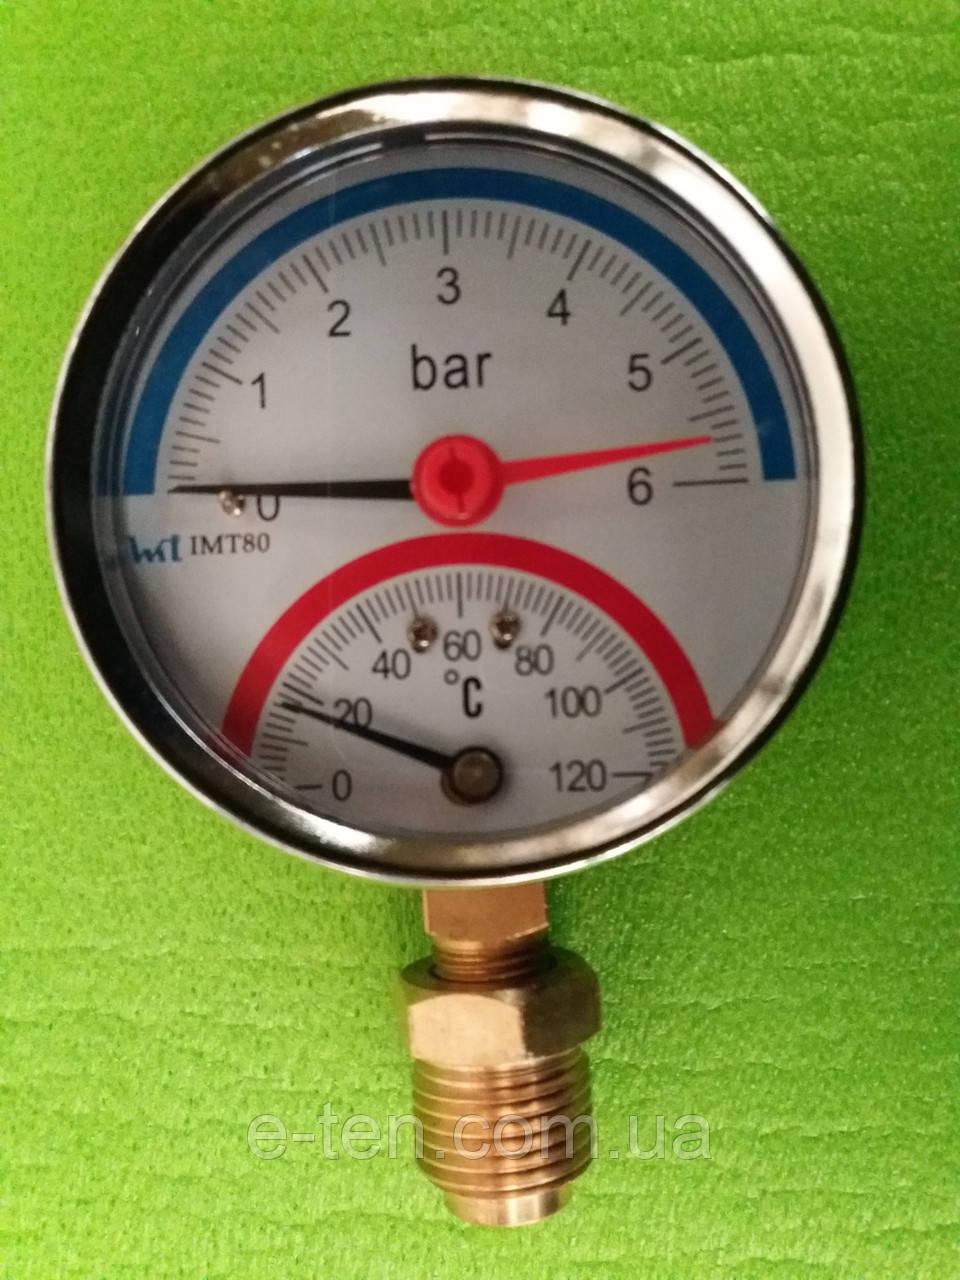 Термоманометр радиальный на резьбе 1/2 дюйма Ø80мм / 0-6 бар / Tmax=120°С Китай